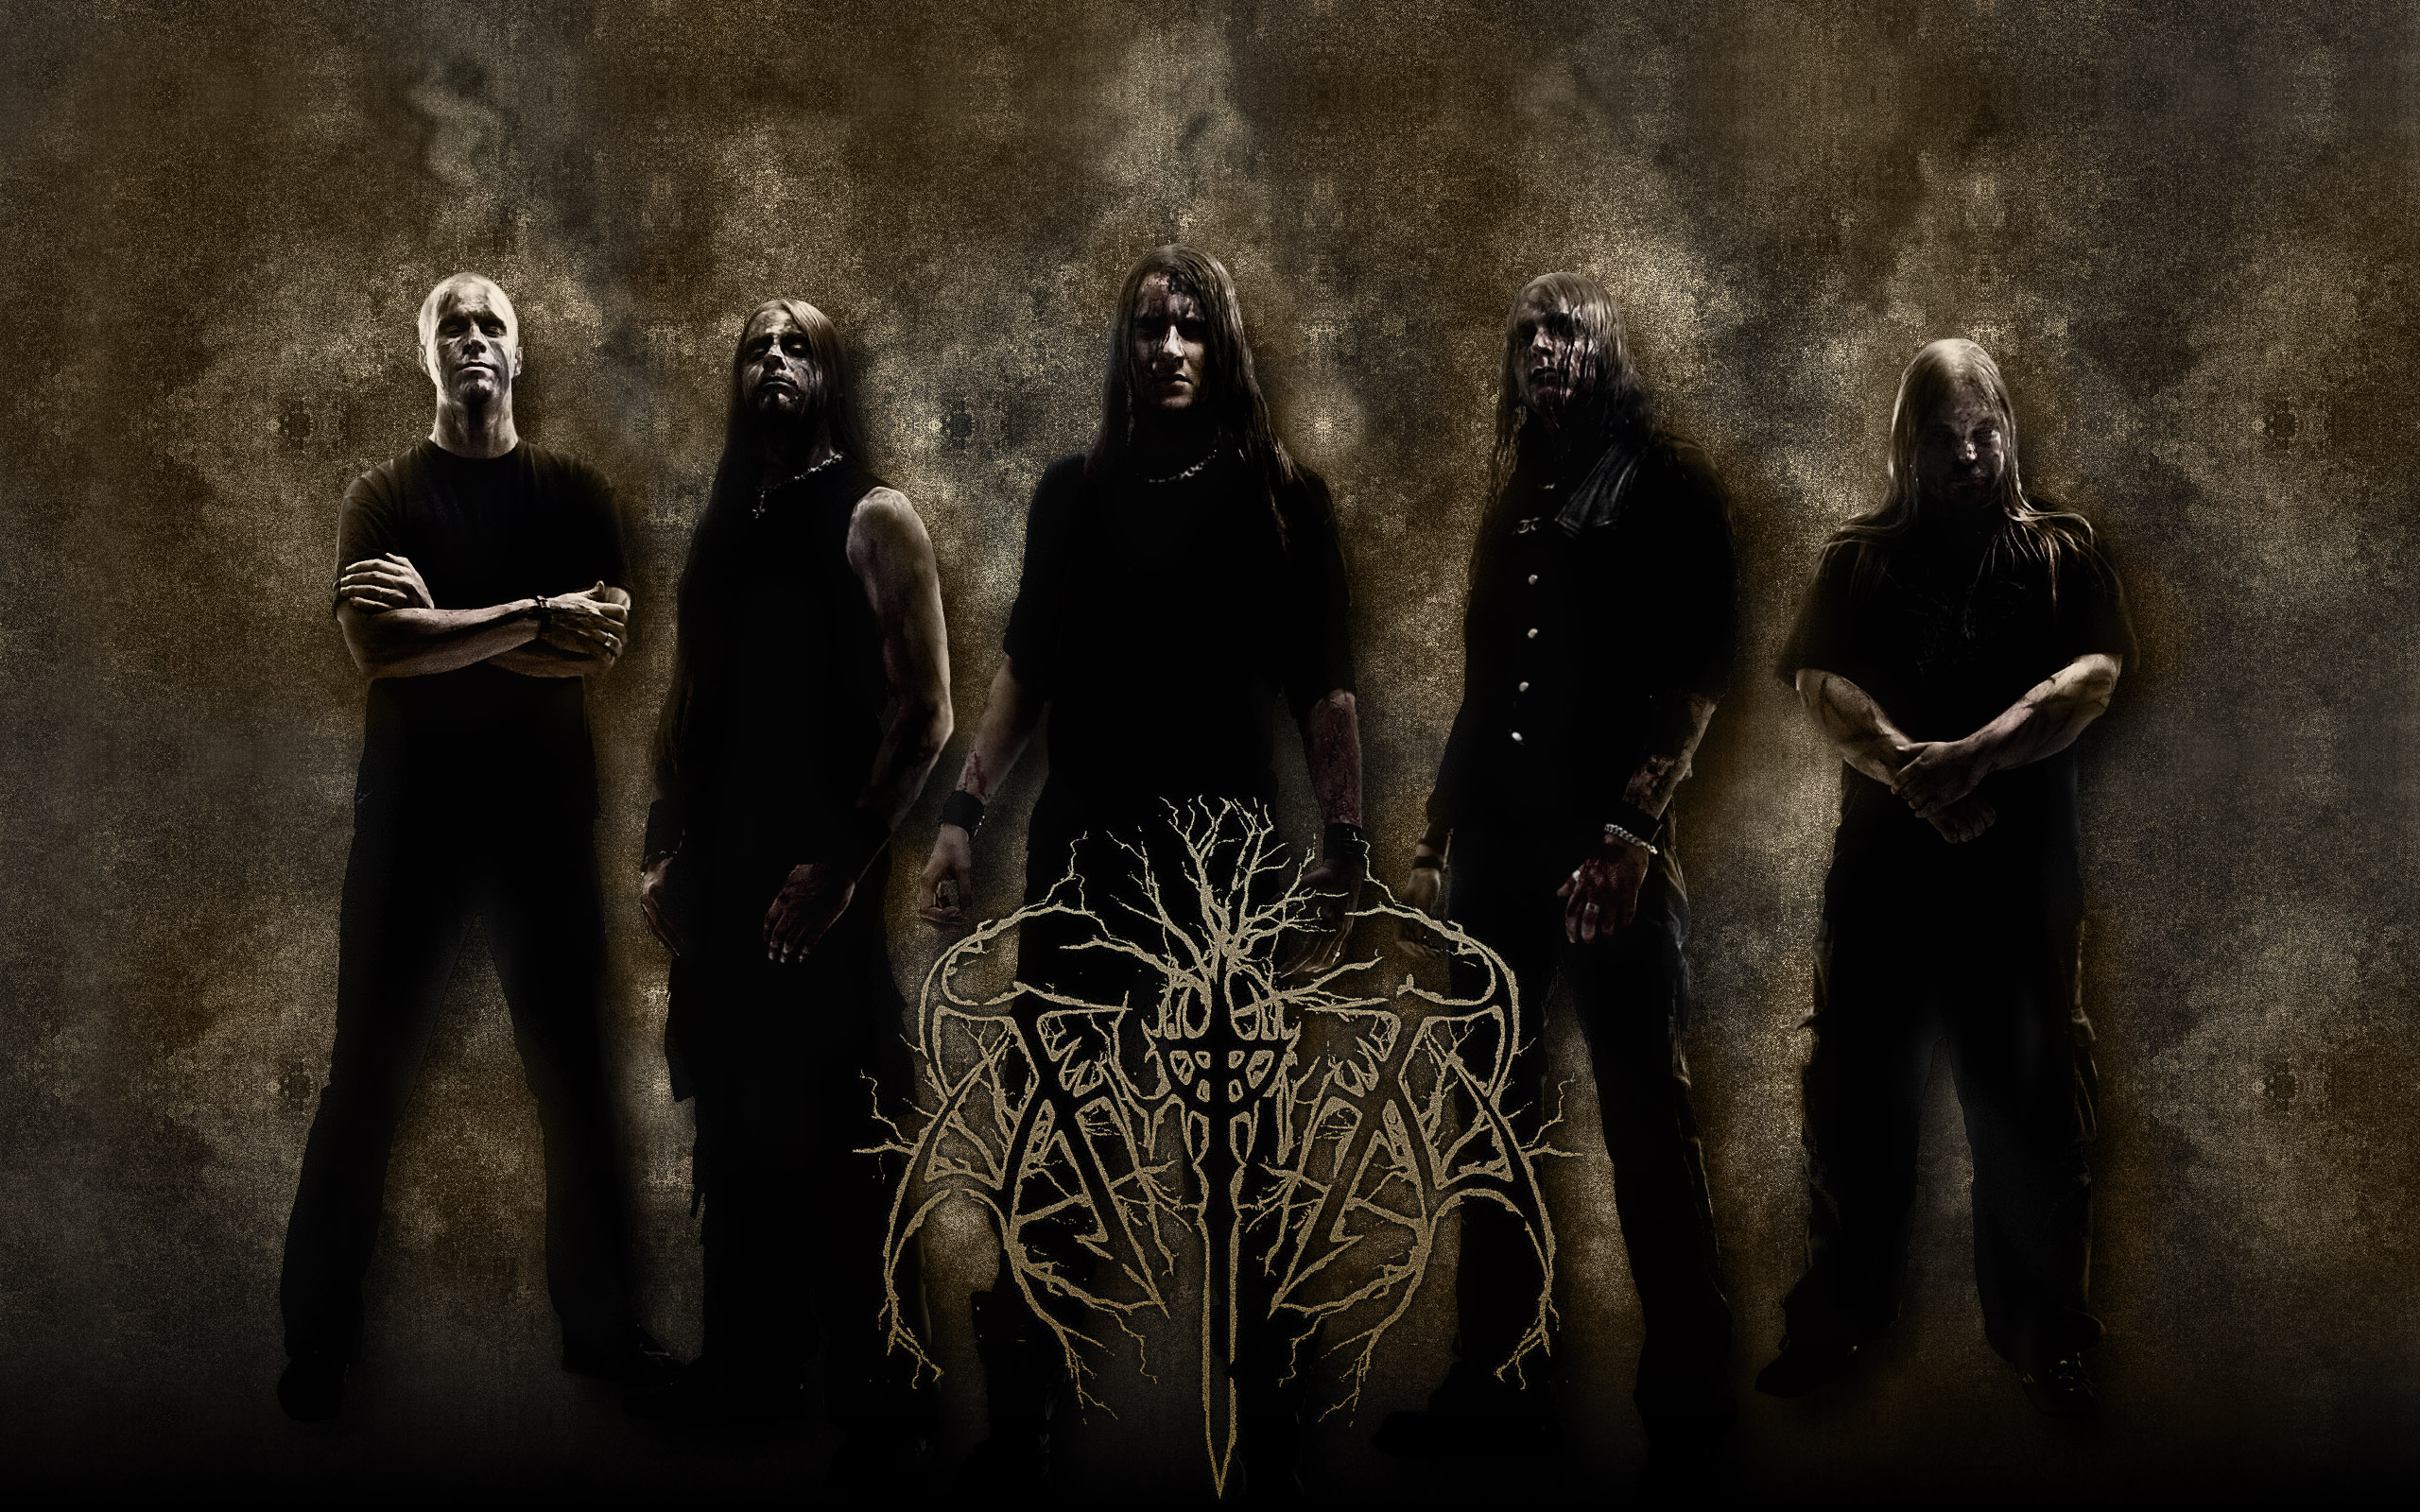 Death band wallpaper wallpapersafari - Death metal wallpaper ...